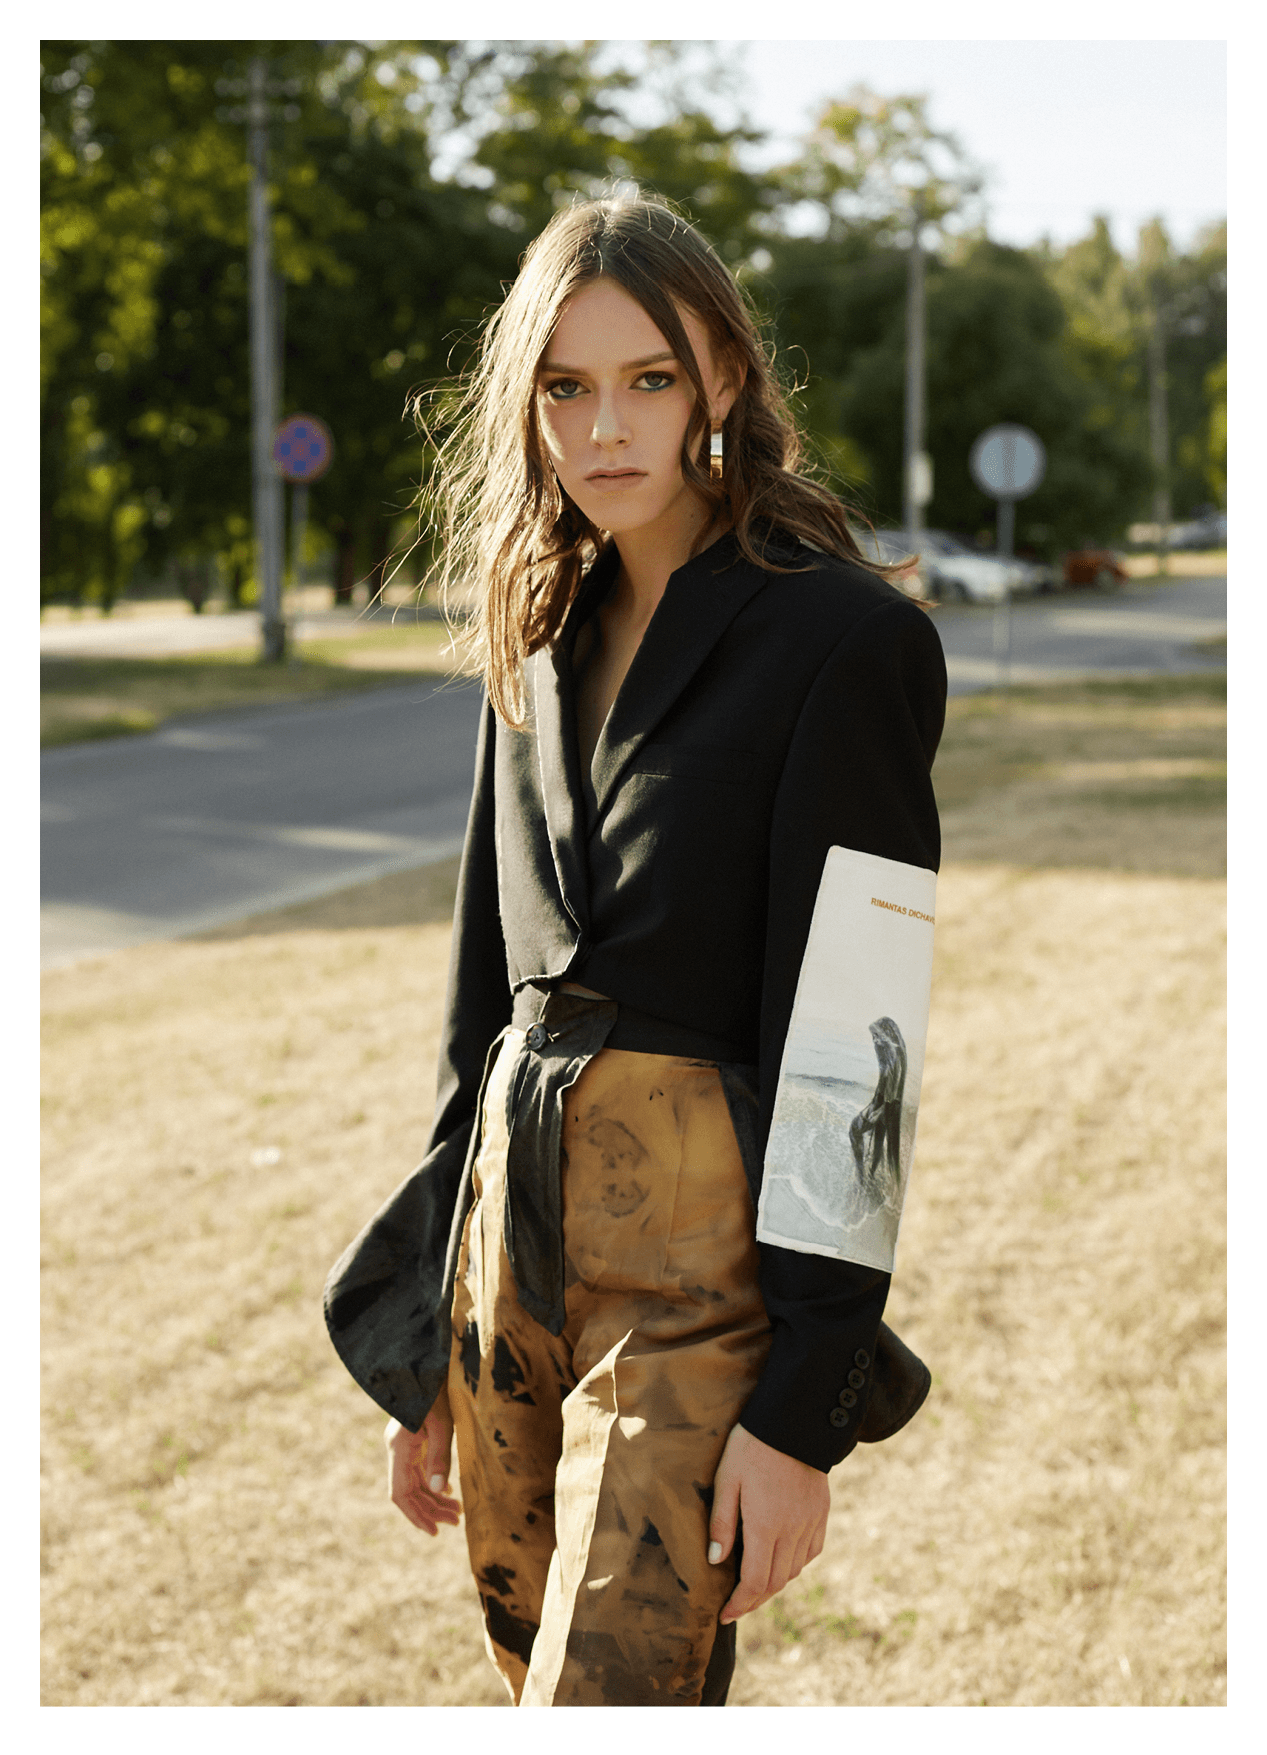 jacket, trousers URTE KATILIUTE; earrings H&M